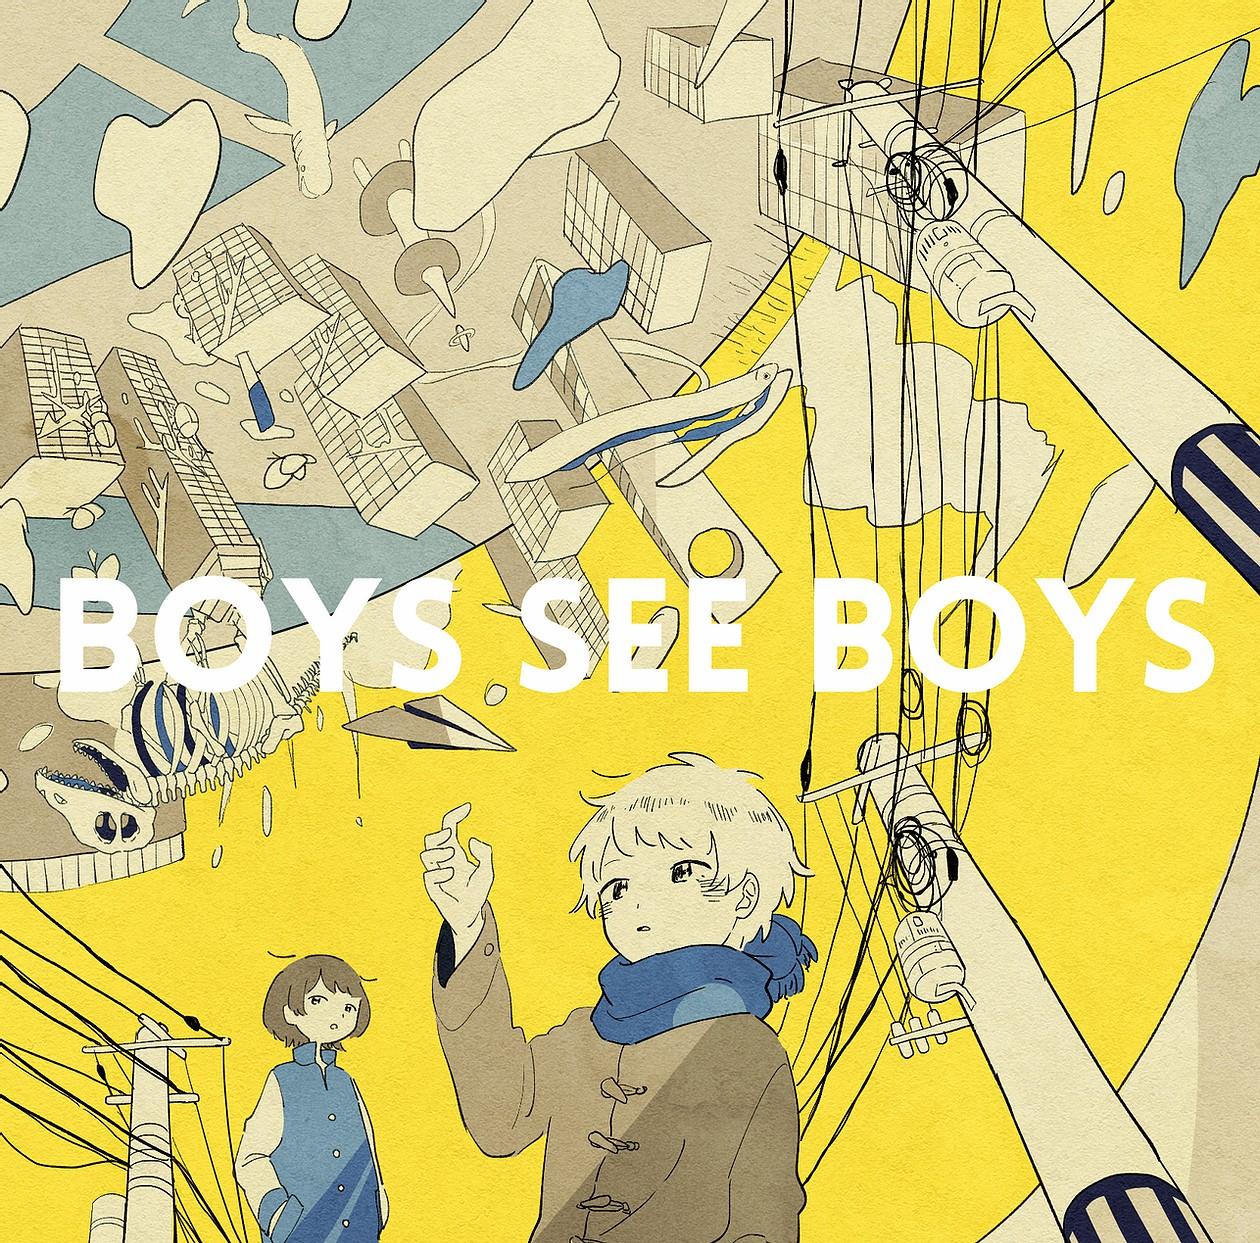 BOYS SEE BOYS (album)